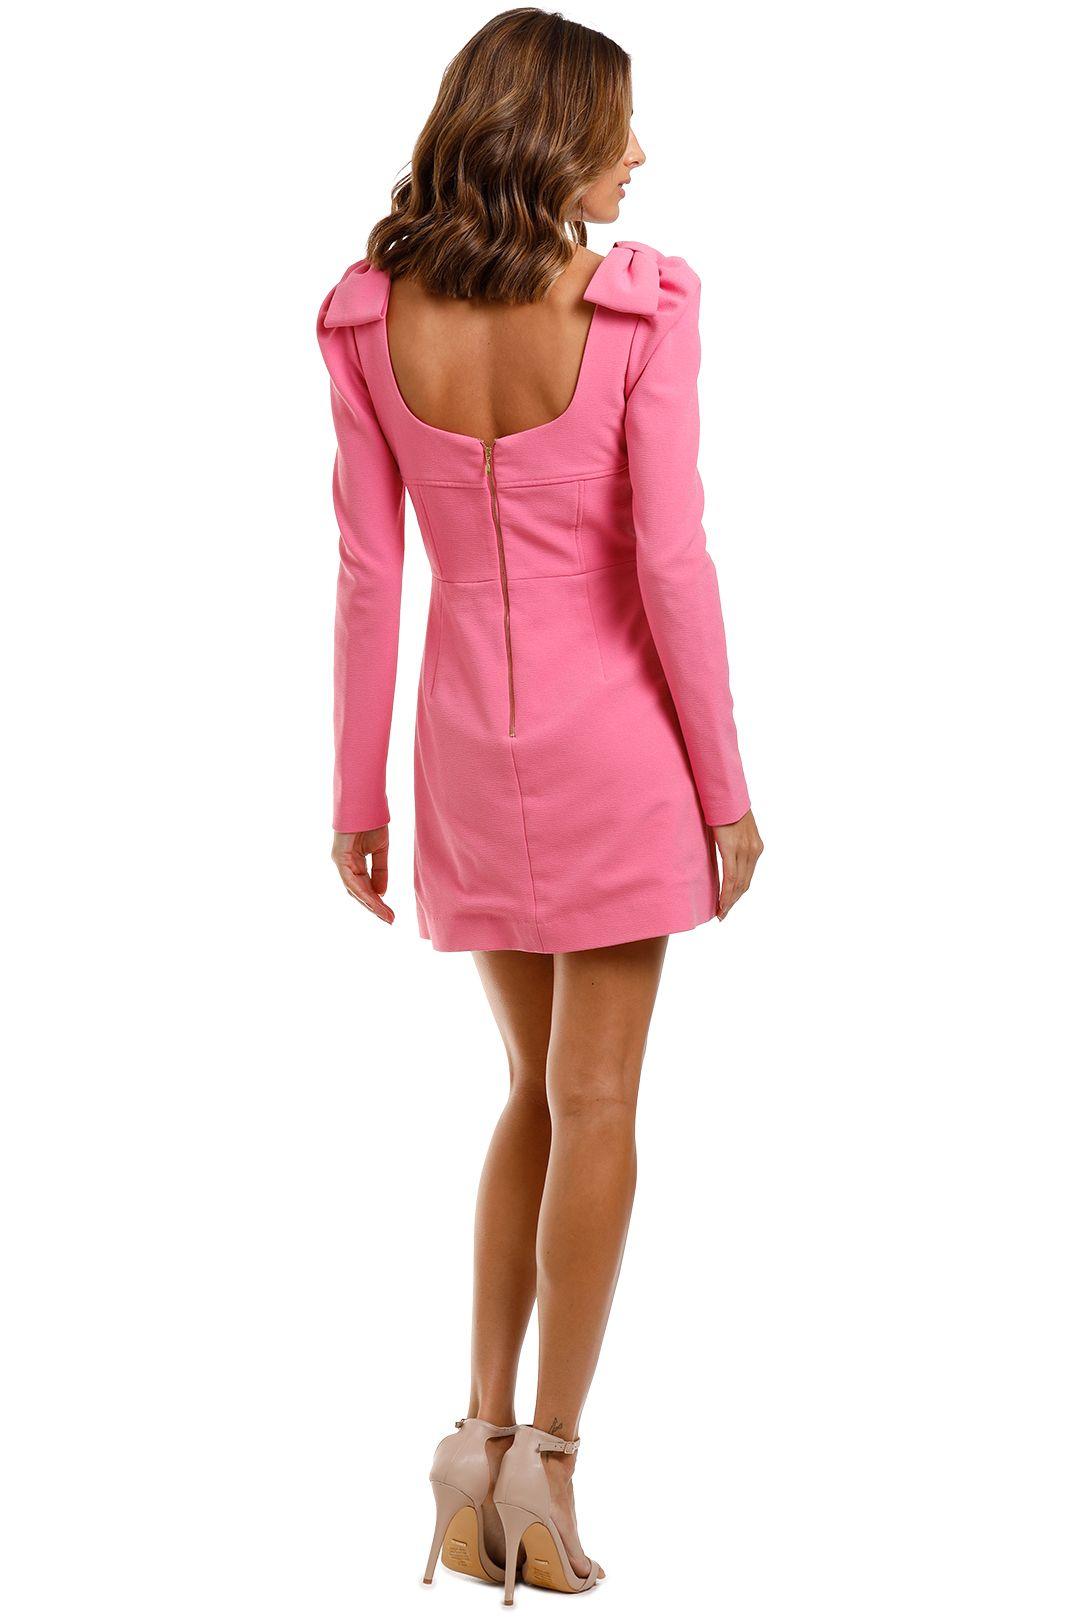 Rebecca Vallance Love Mini Dress Pink Scoop Neck